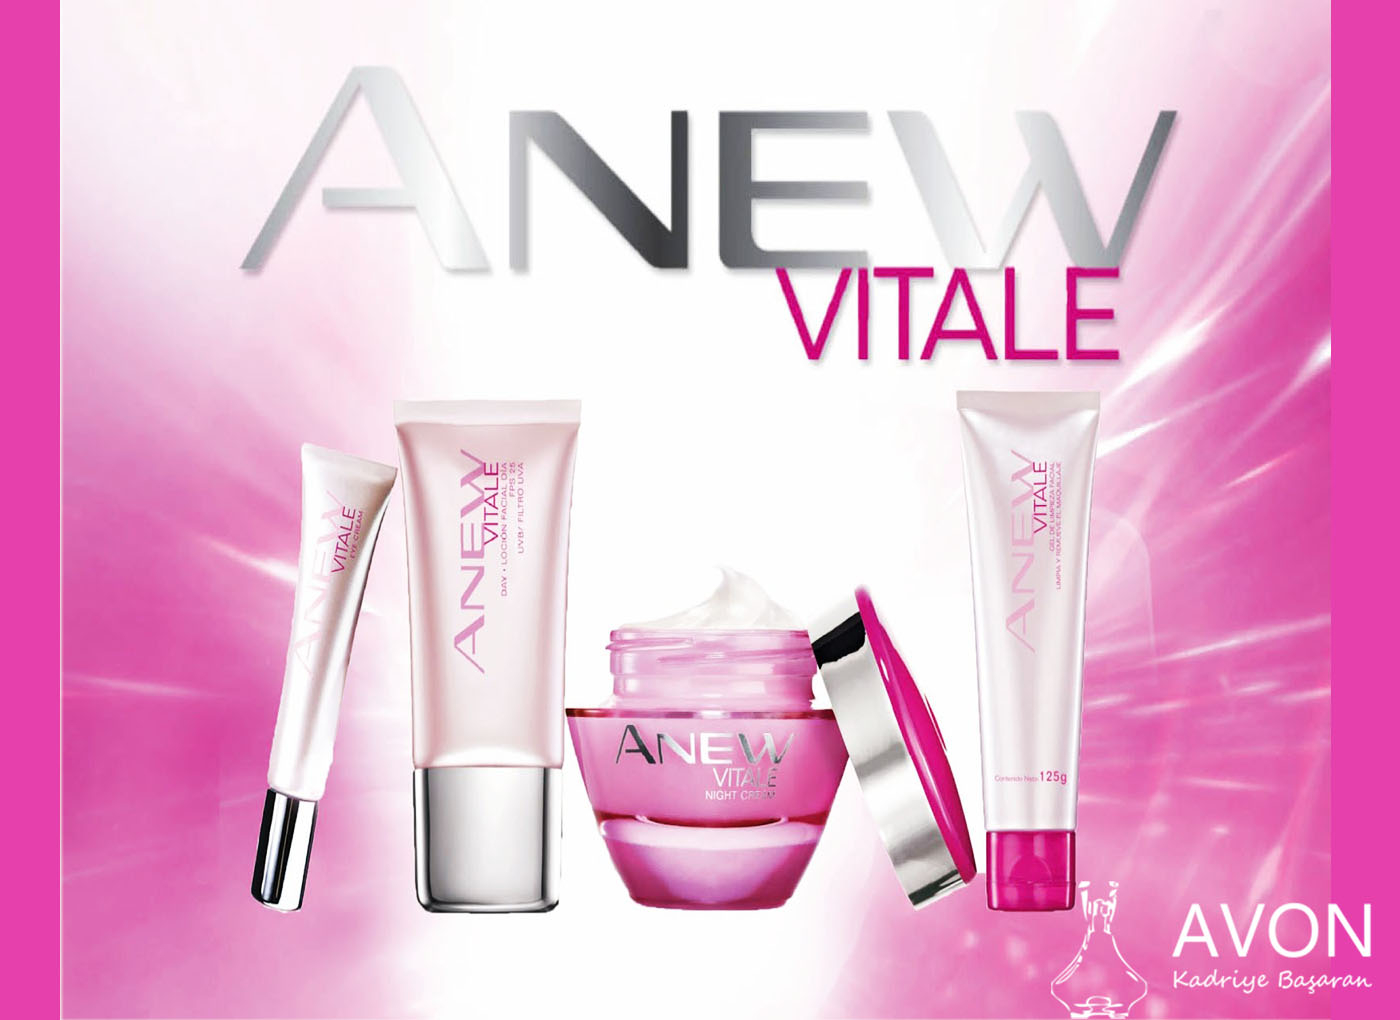 Avon Anew Vitale Serisi